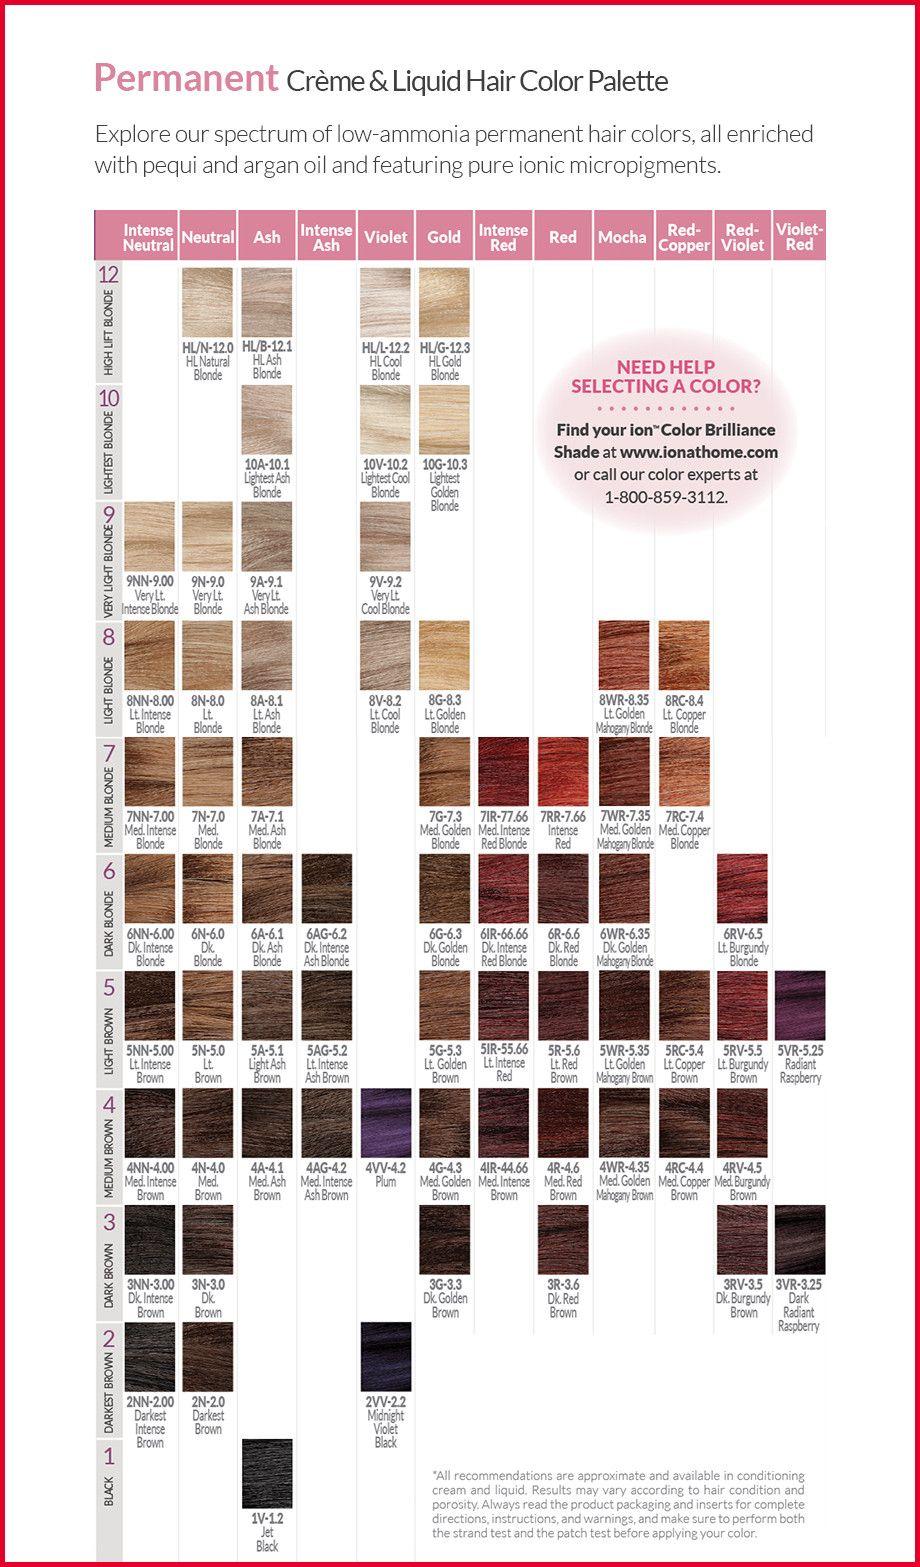 New Ion Permanent Hair Color Chart Pics Of Hair Color Trends Tweet Https Bestekurzehaare Com New Ion P Hair Color Chart Permanent Hair Color Ion Hair Colors